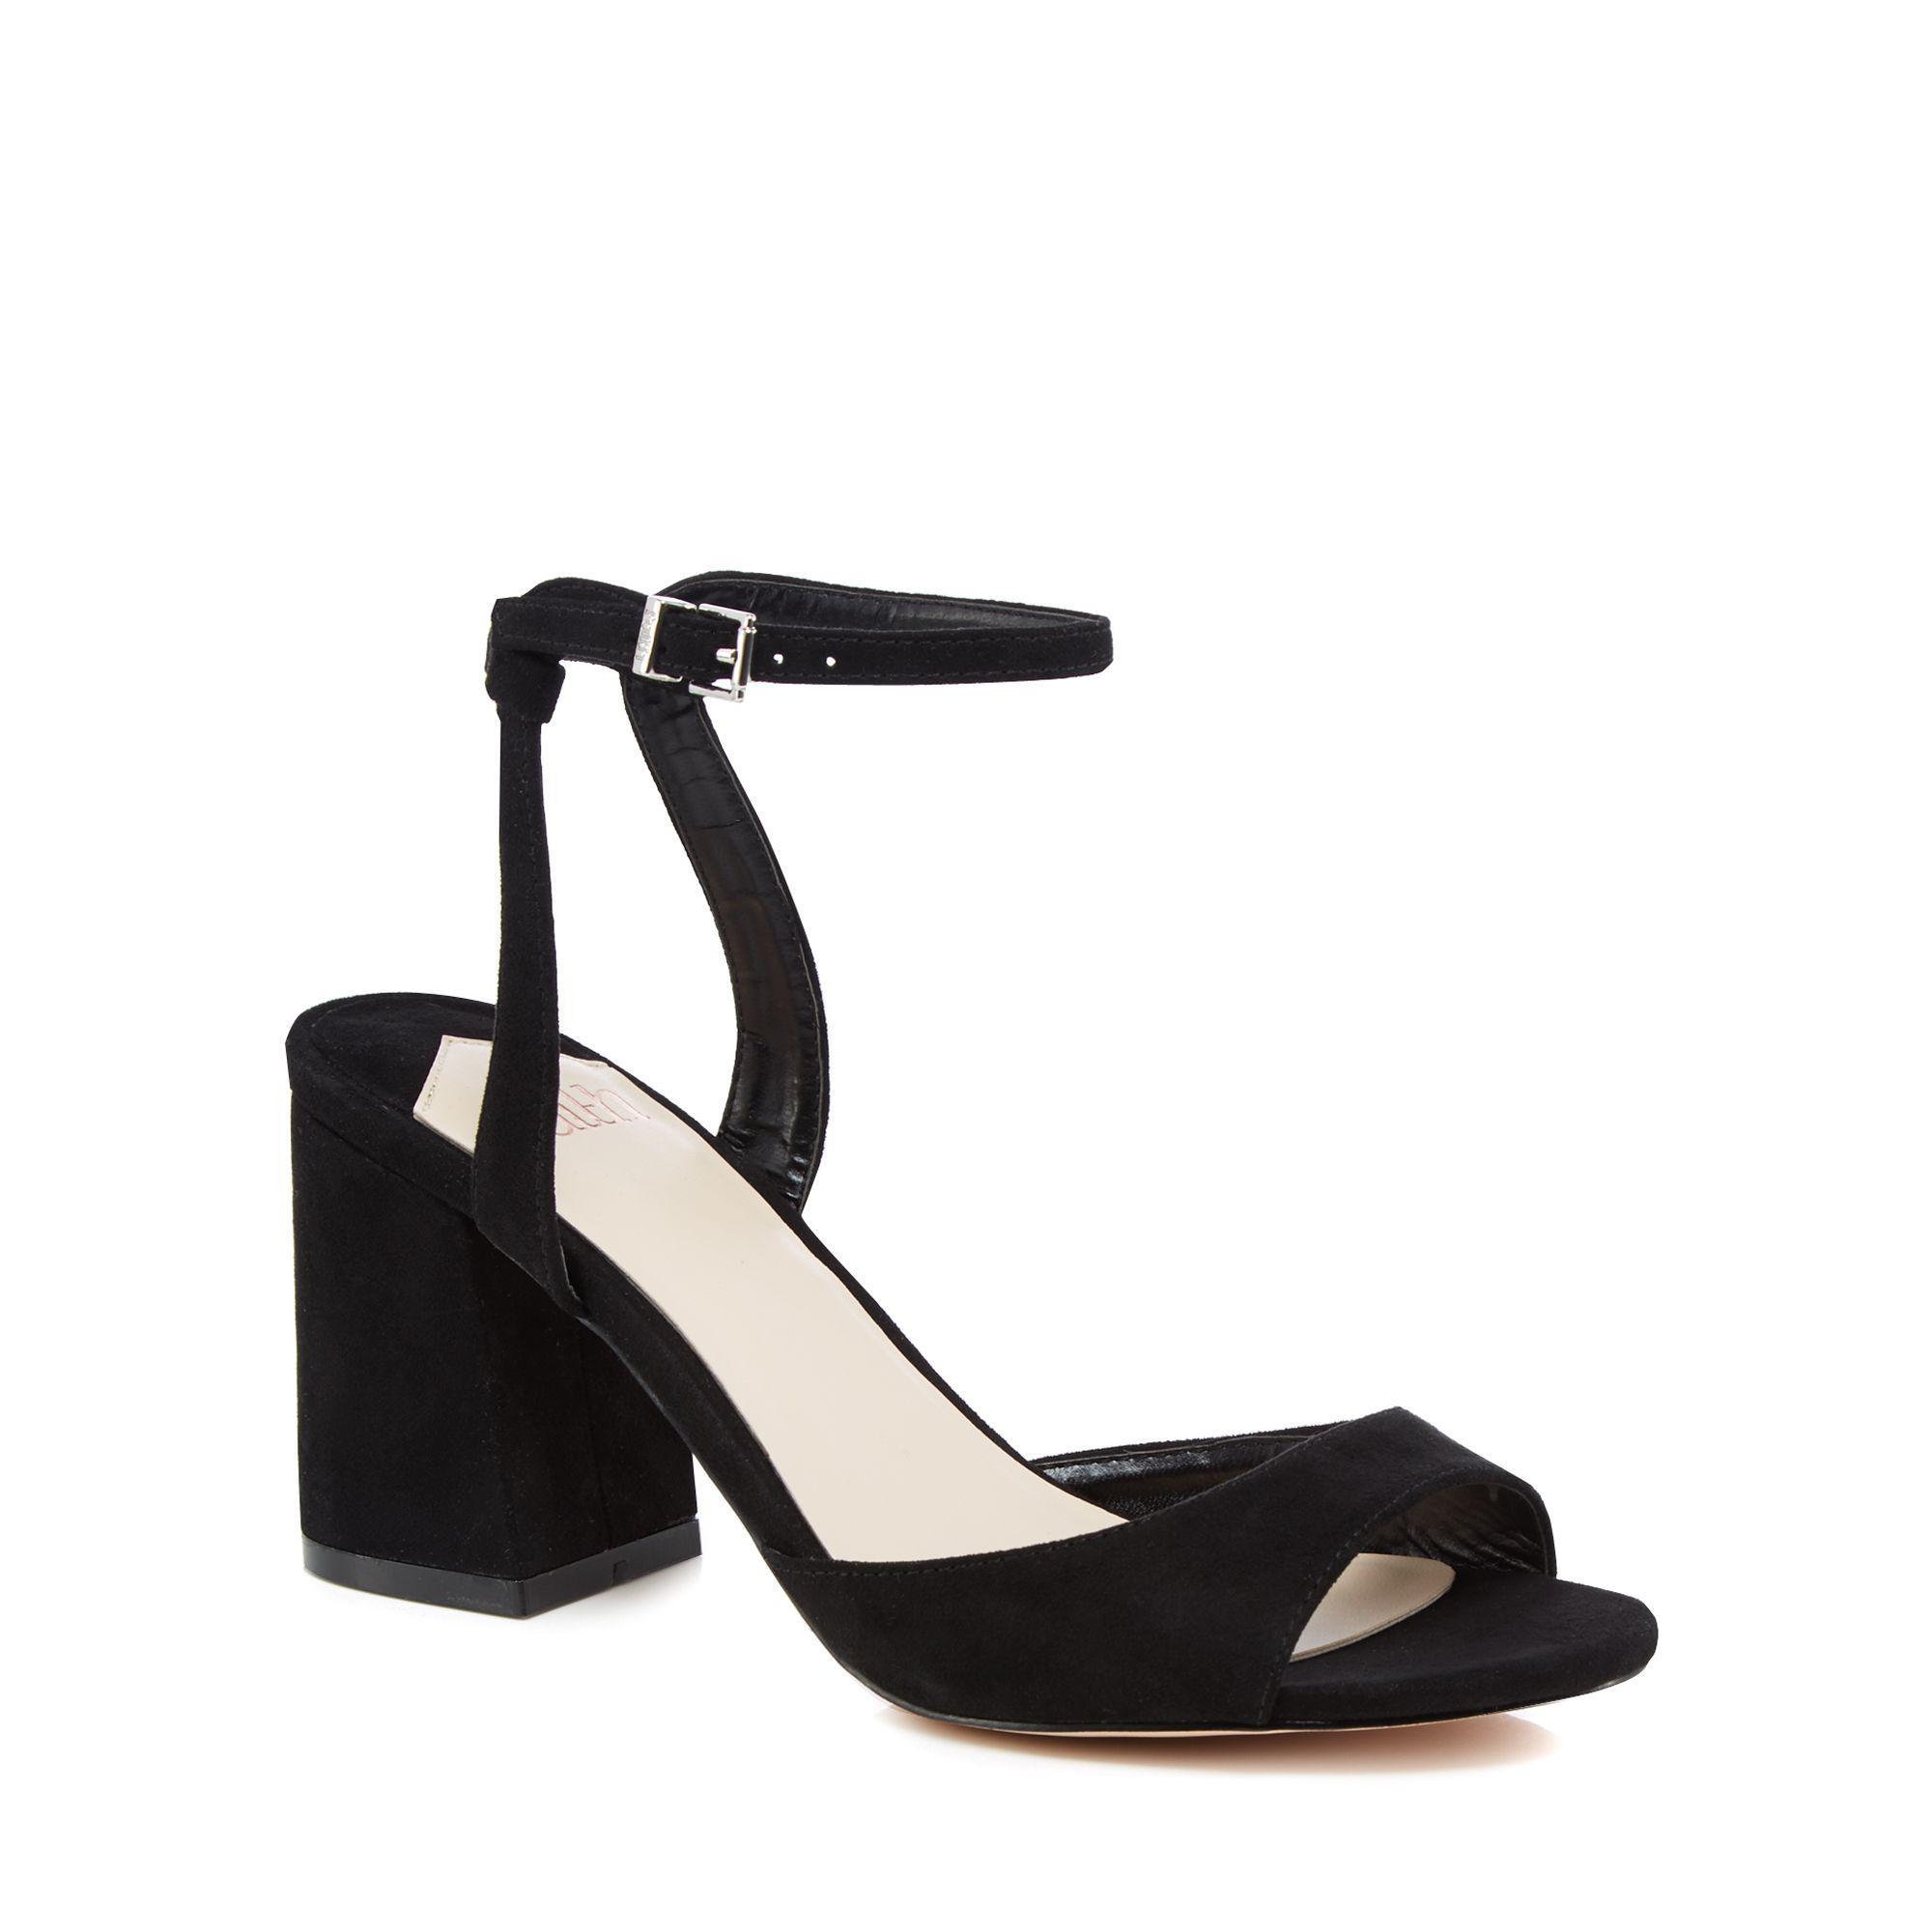 9baa4ca2f949 Faith - Black Suedette  danicar  Mid Block Heel Ankle Strap Sandals - Lyst.  View fullscreen